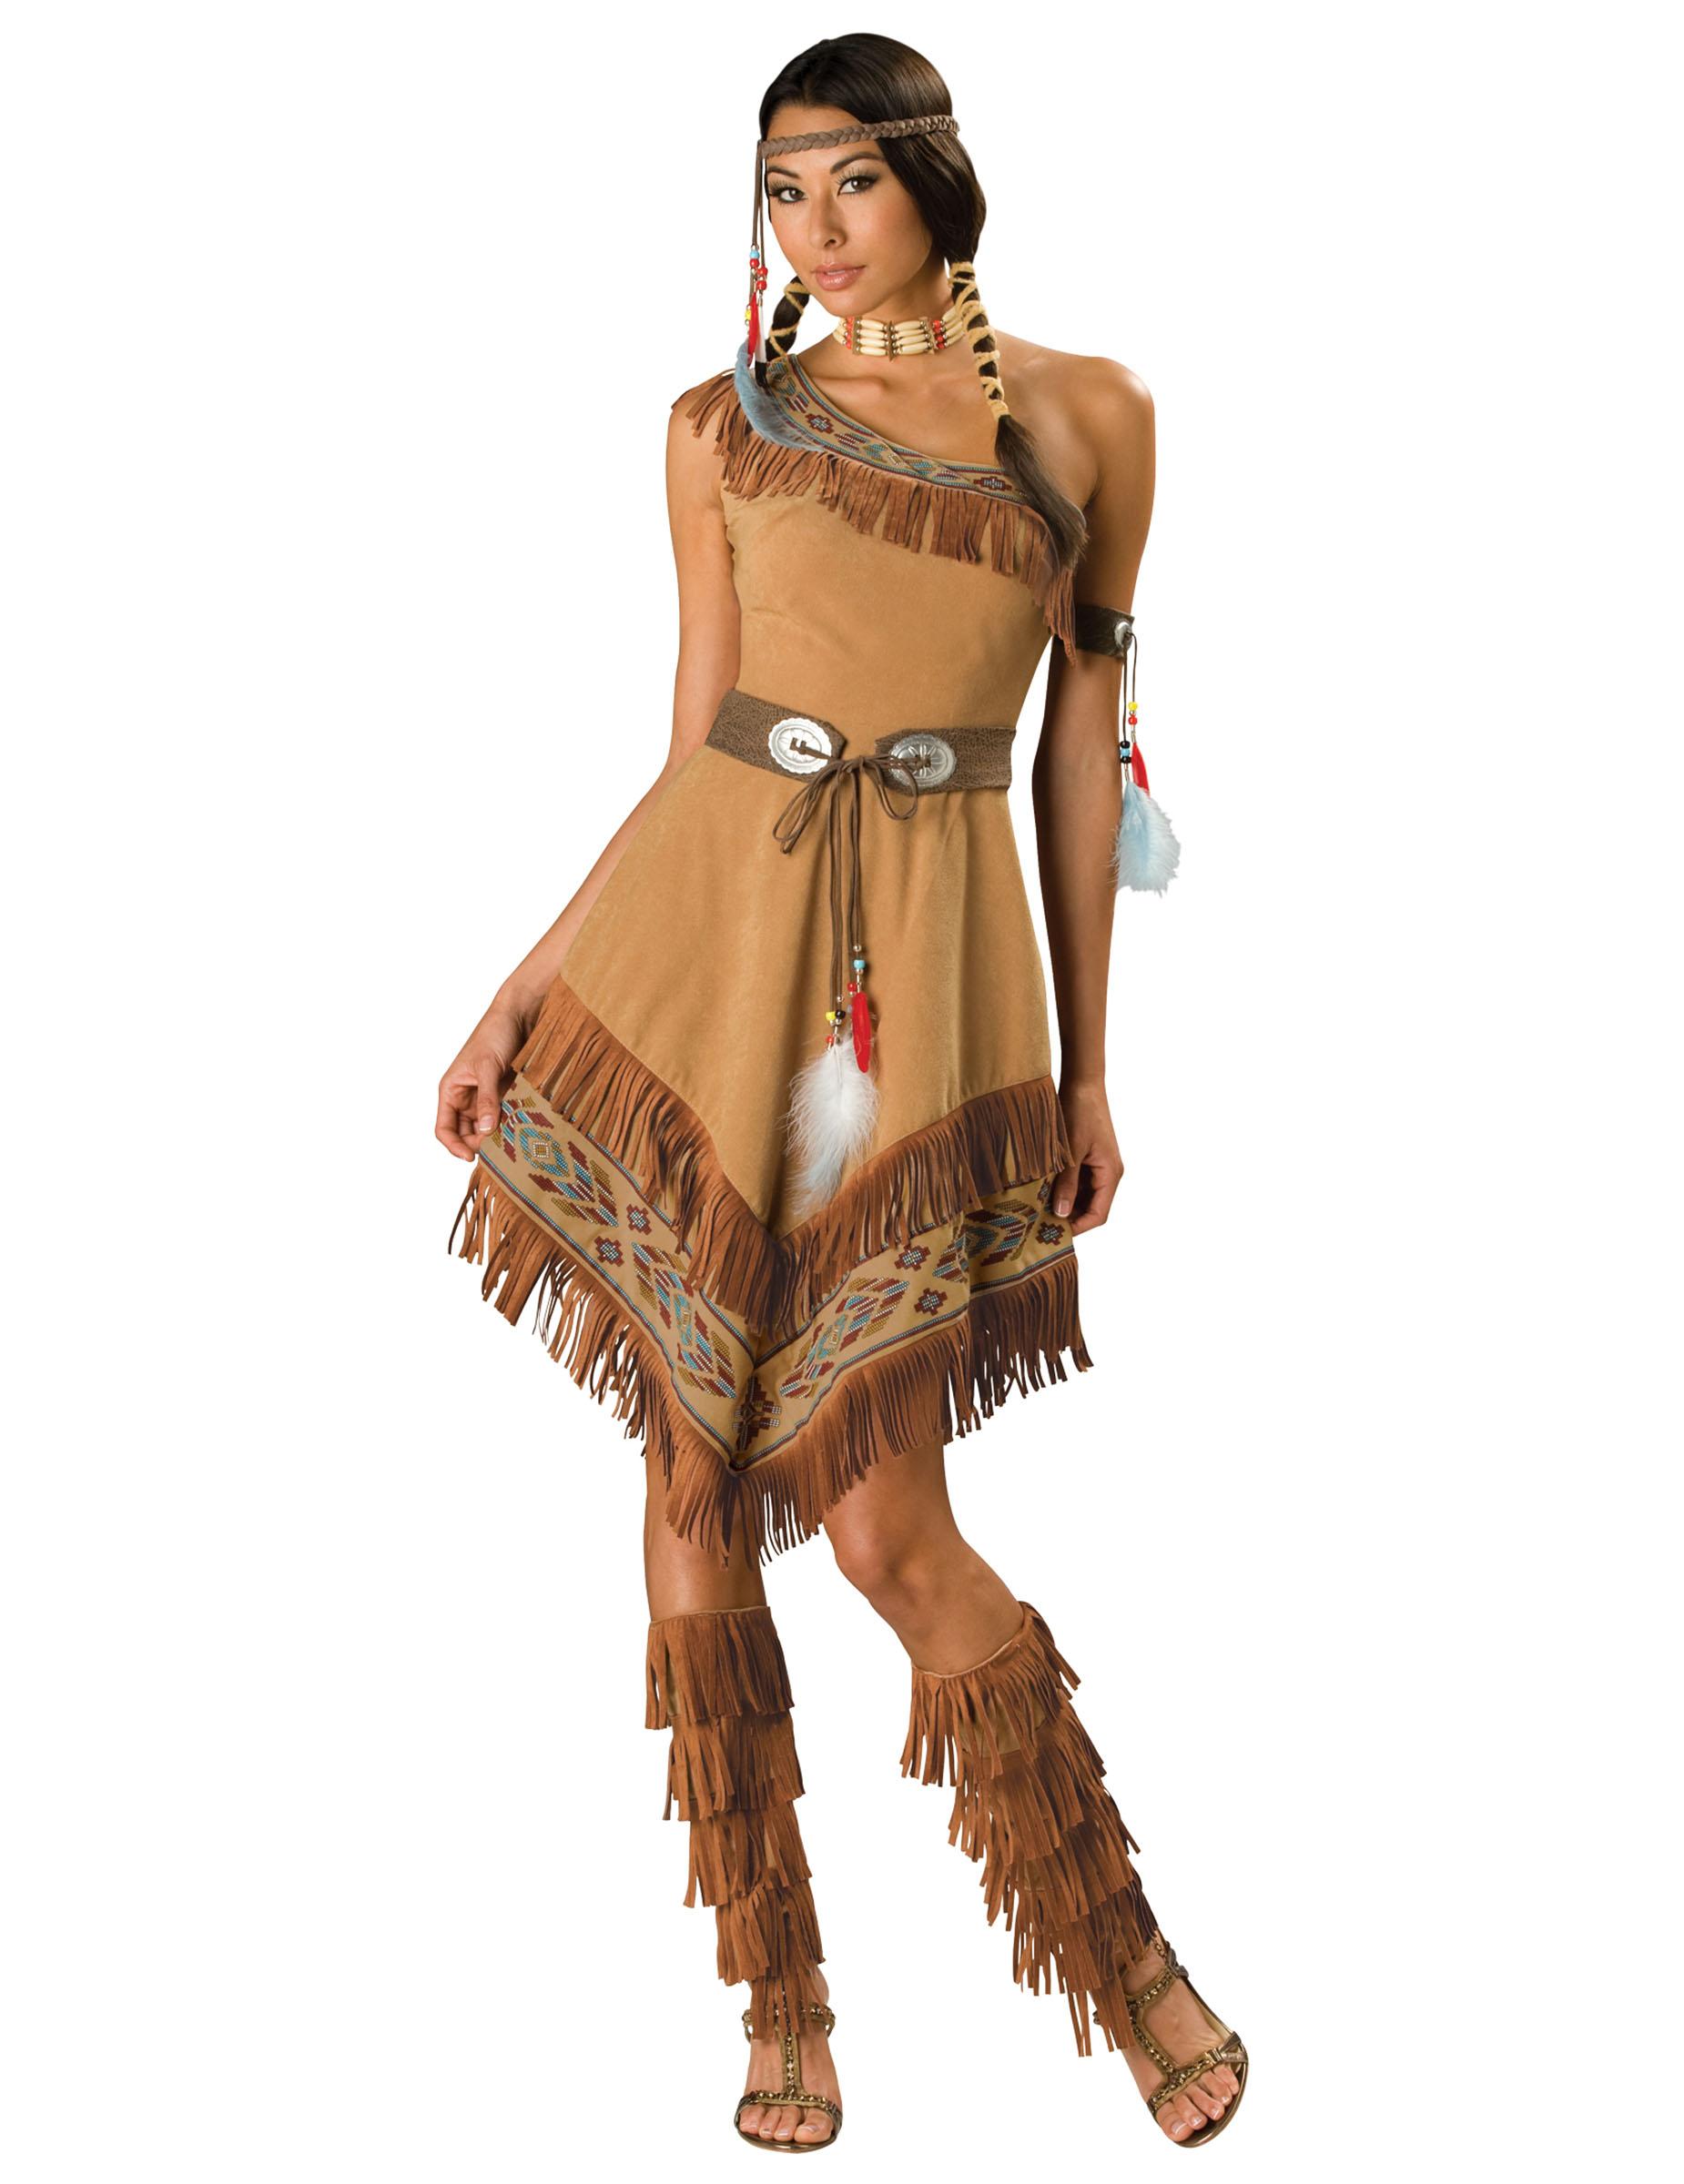 Travestimento Indiana donna - Premium  Costumi adulti 1c518c9bba4c